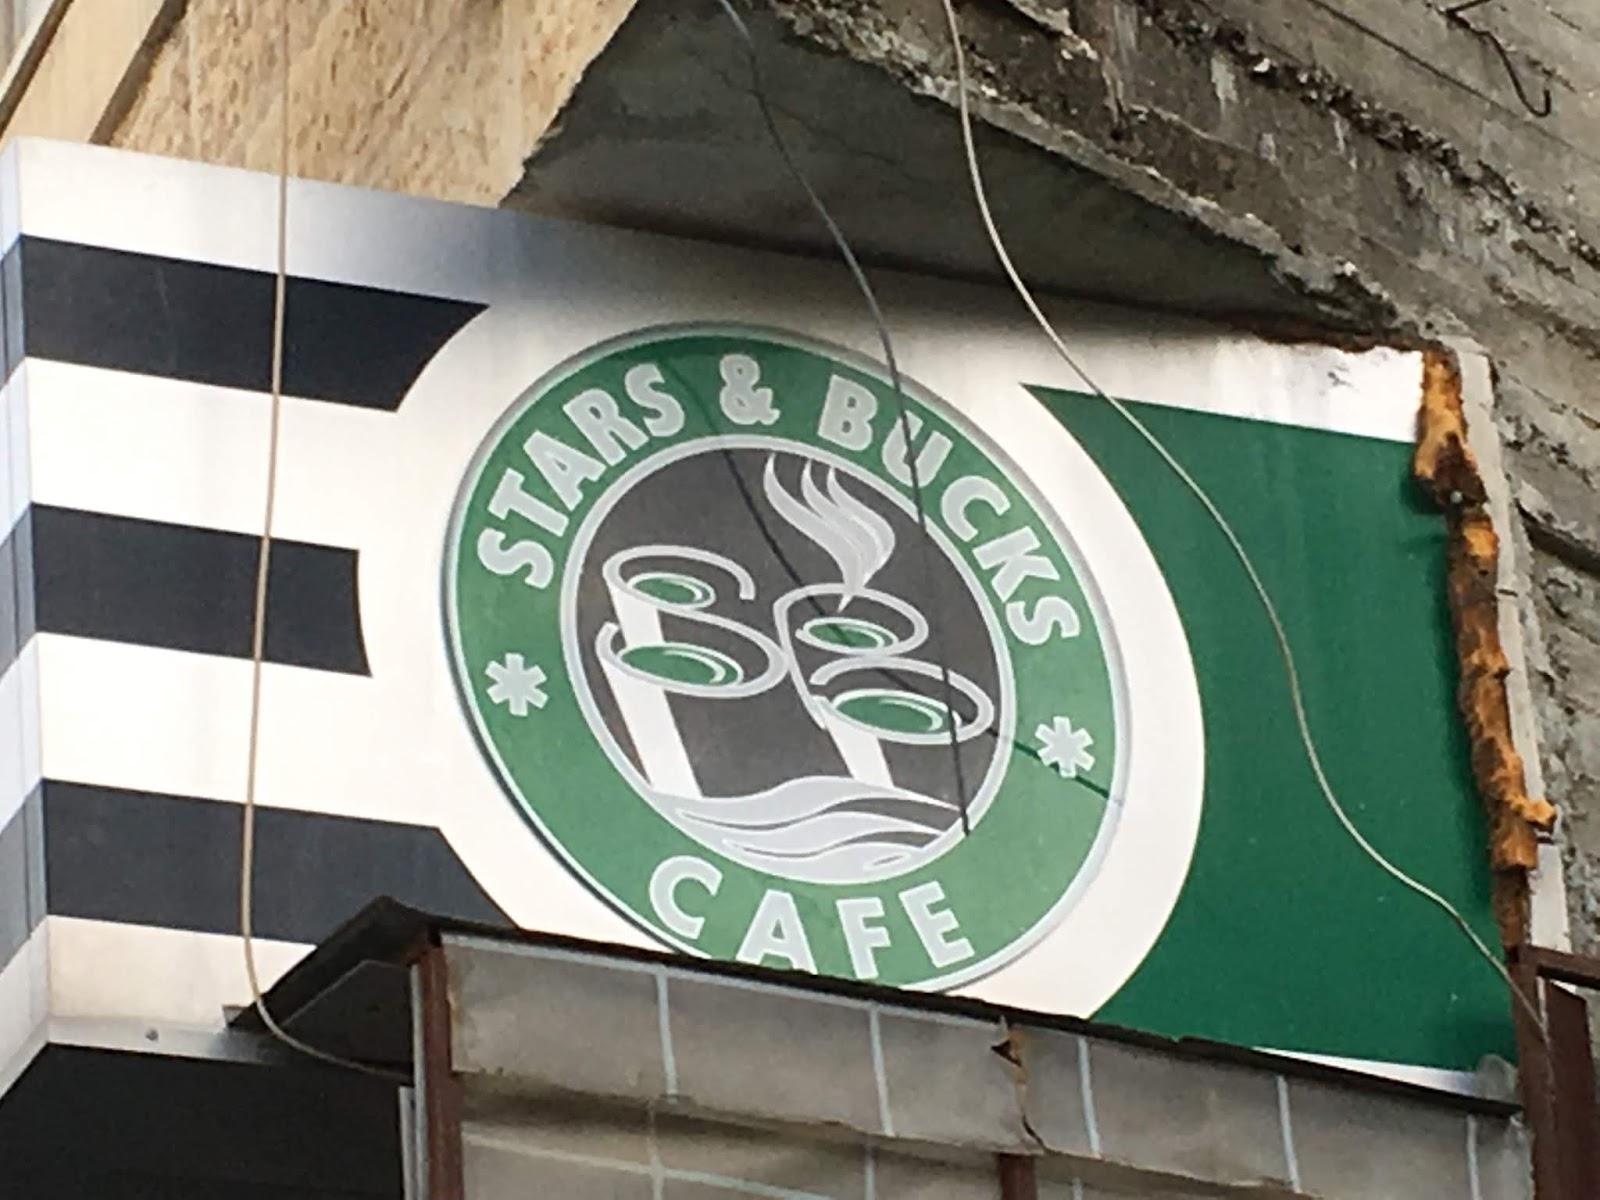 stars and bucks cafe